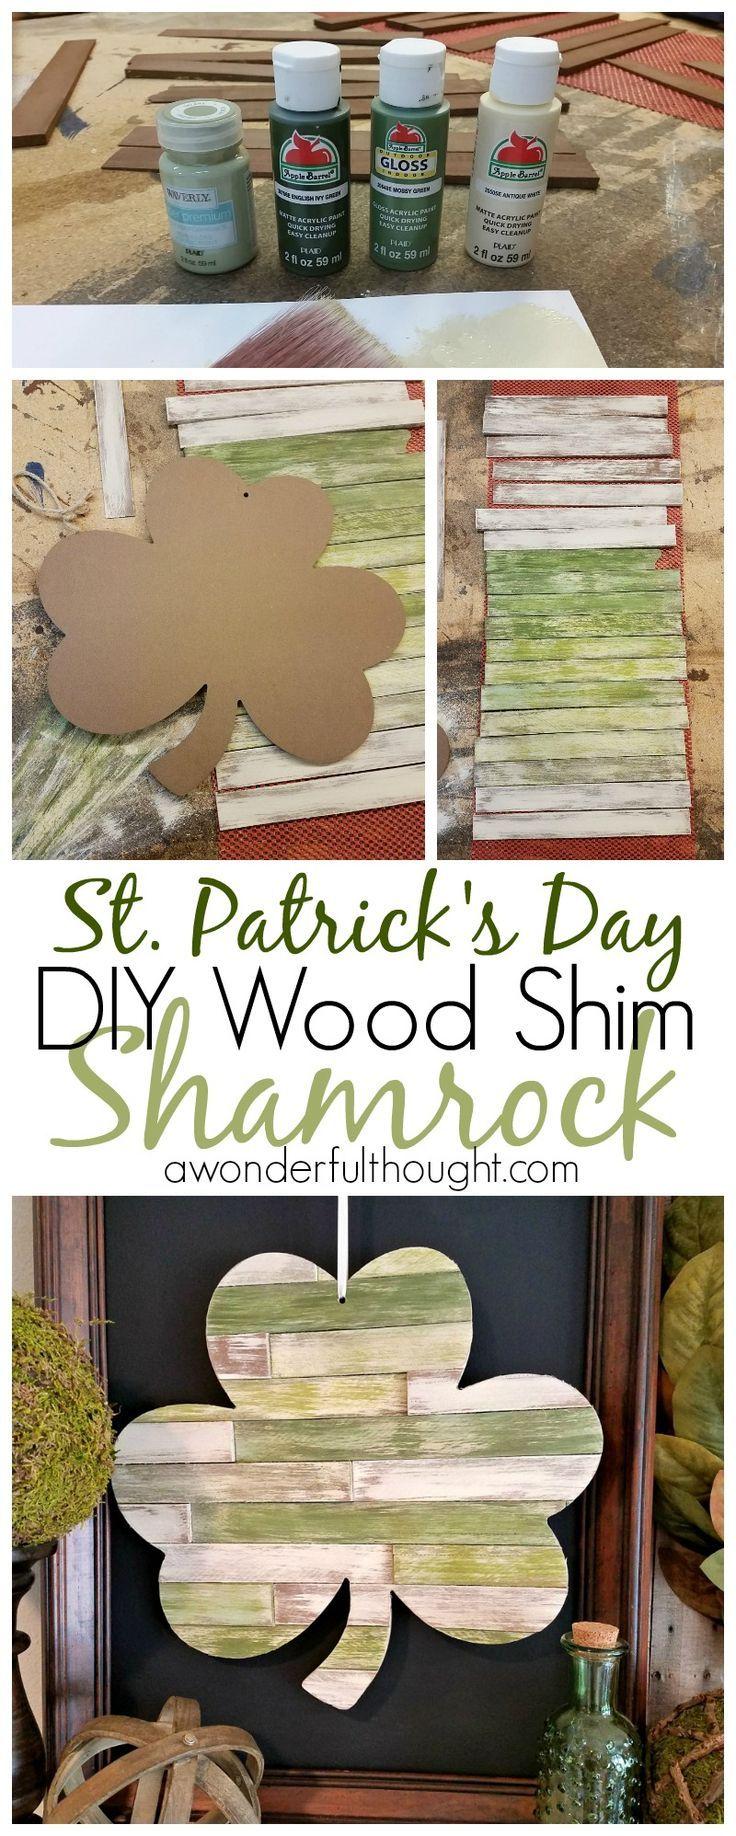 DIY Wood Shim Shamrock